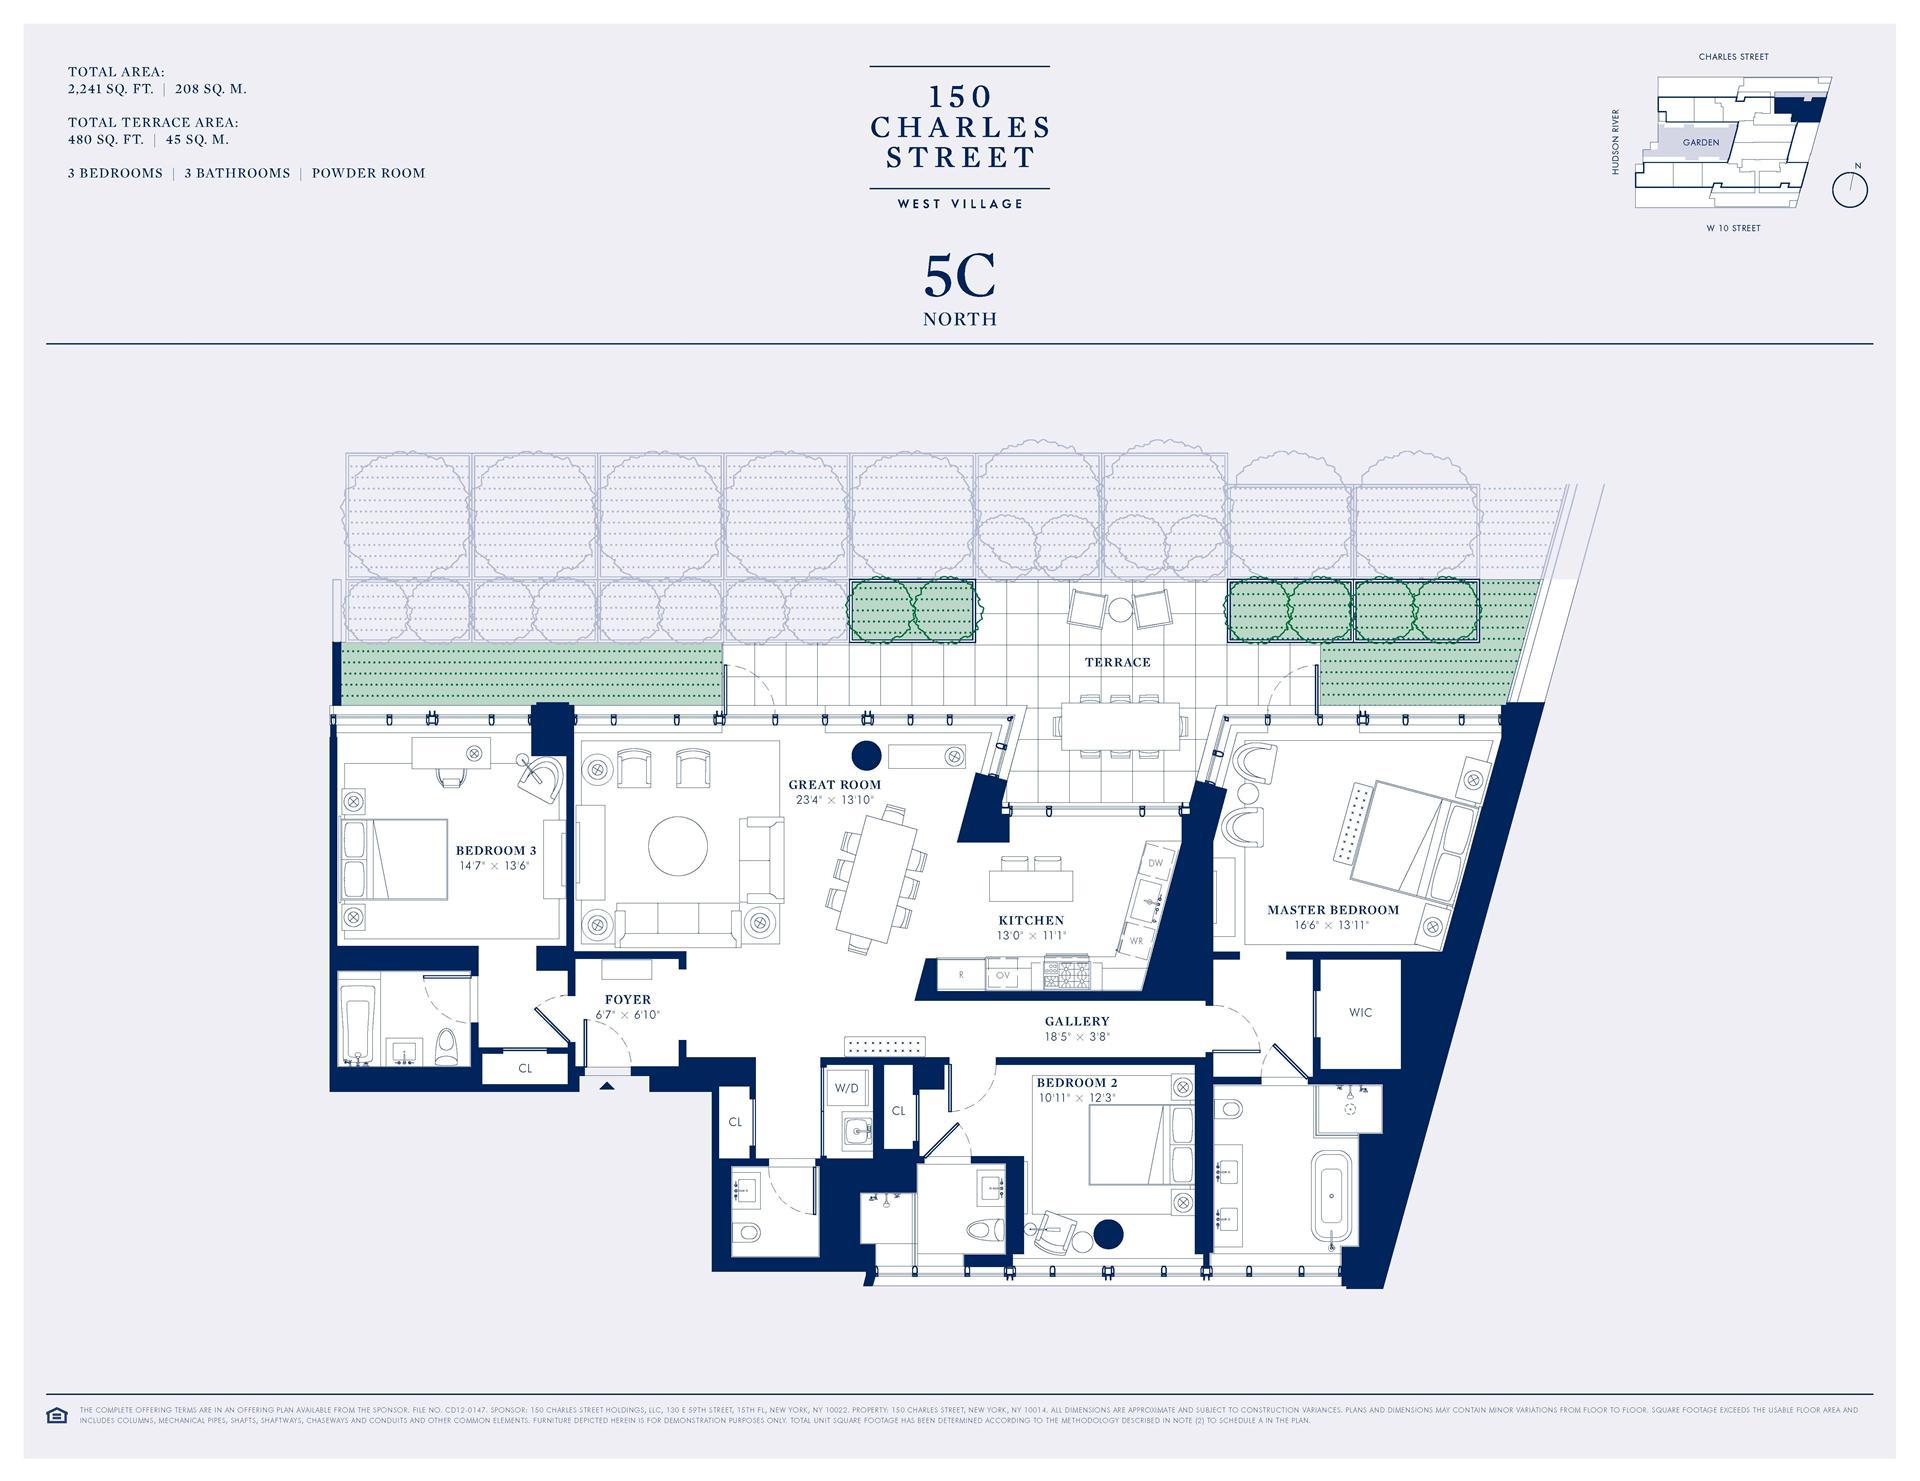 Floor plan of 150 Charles Street, 5CN - West Village - Meatpacking District, New York